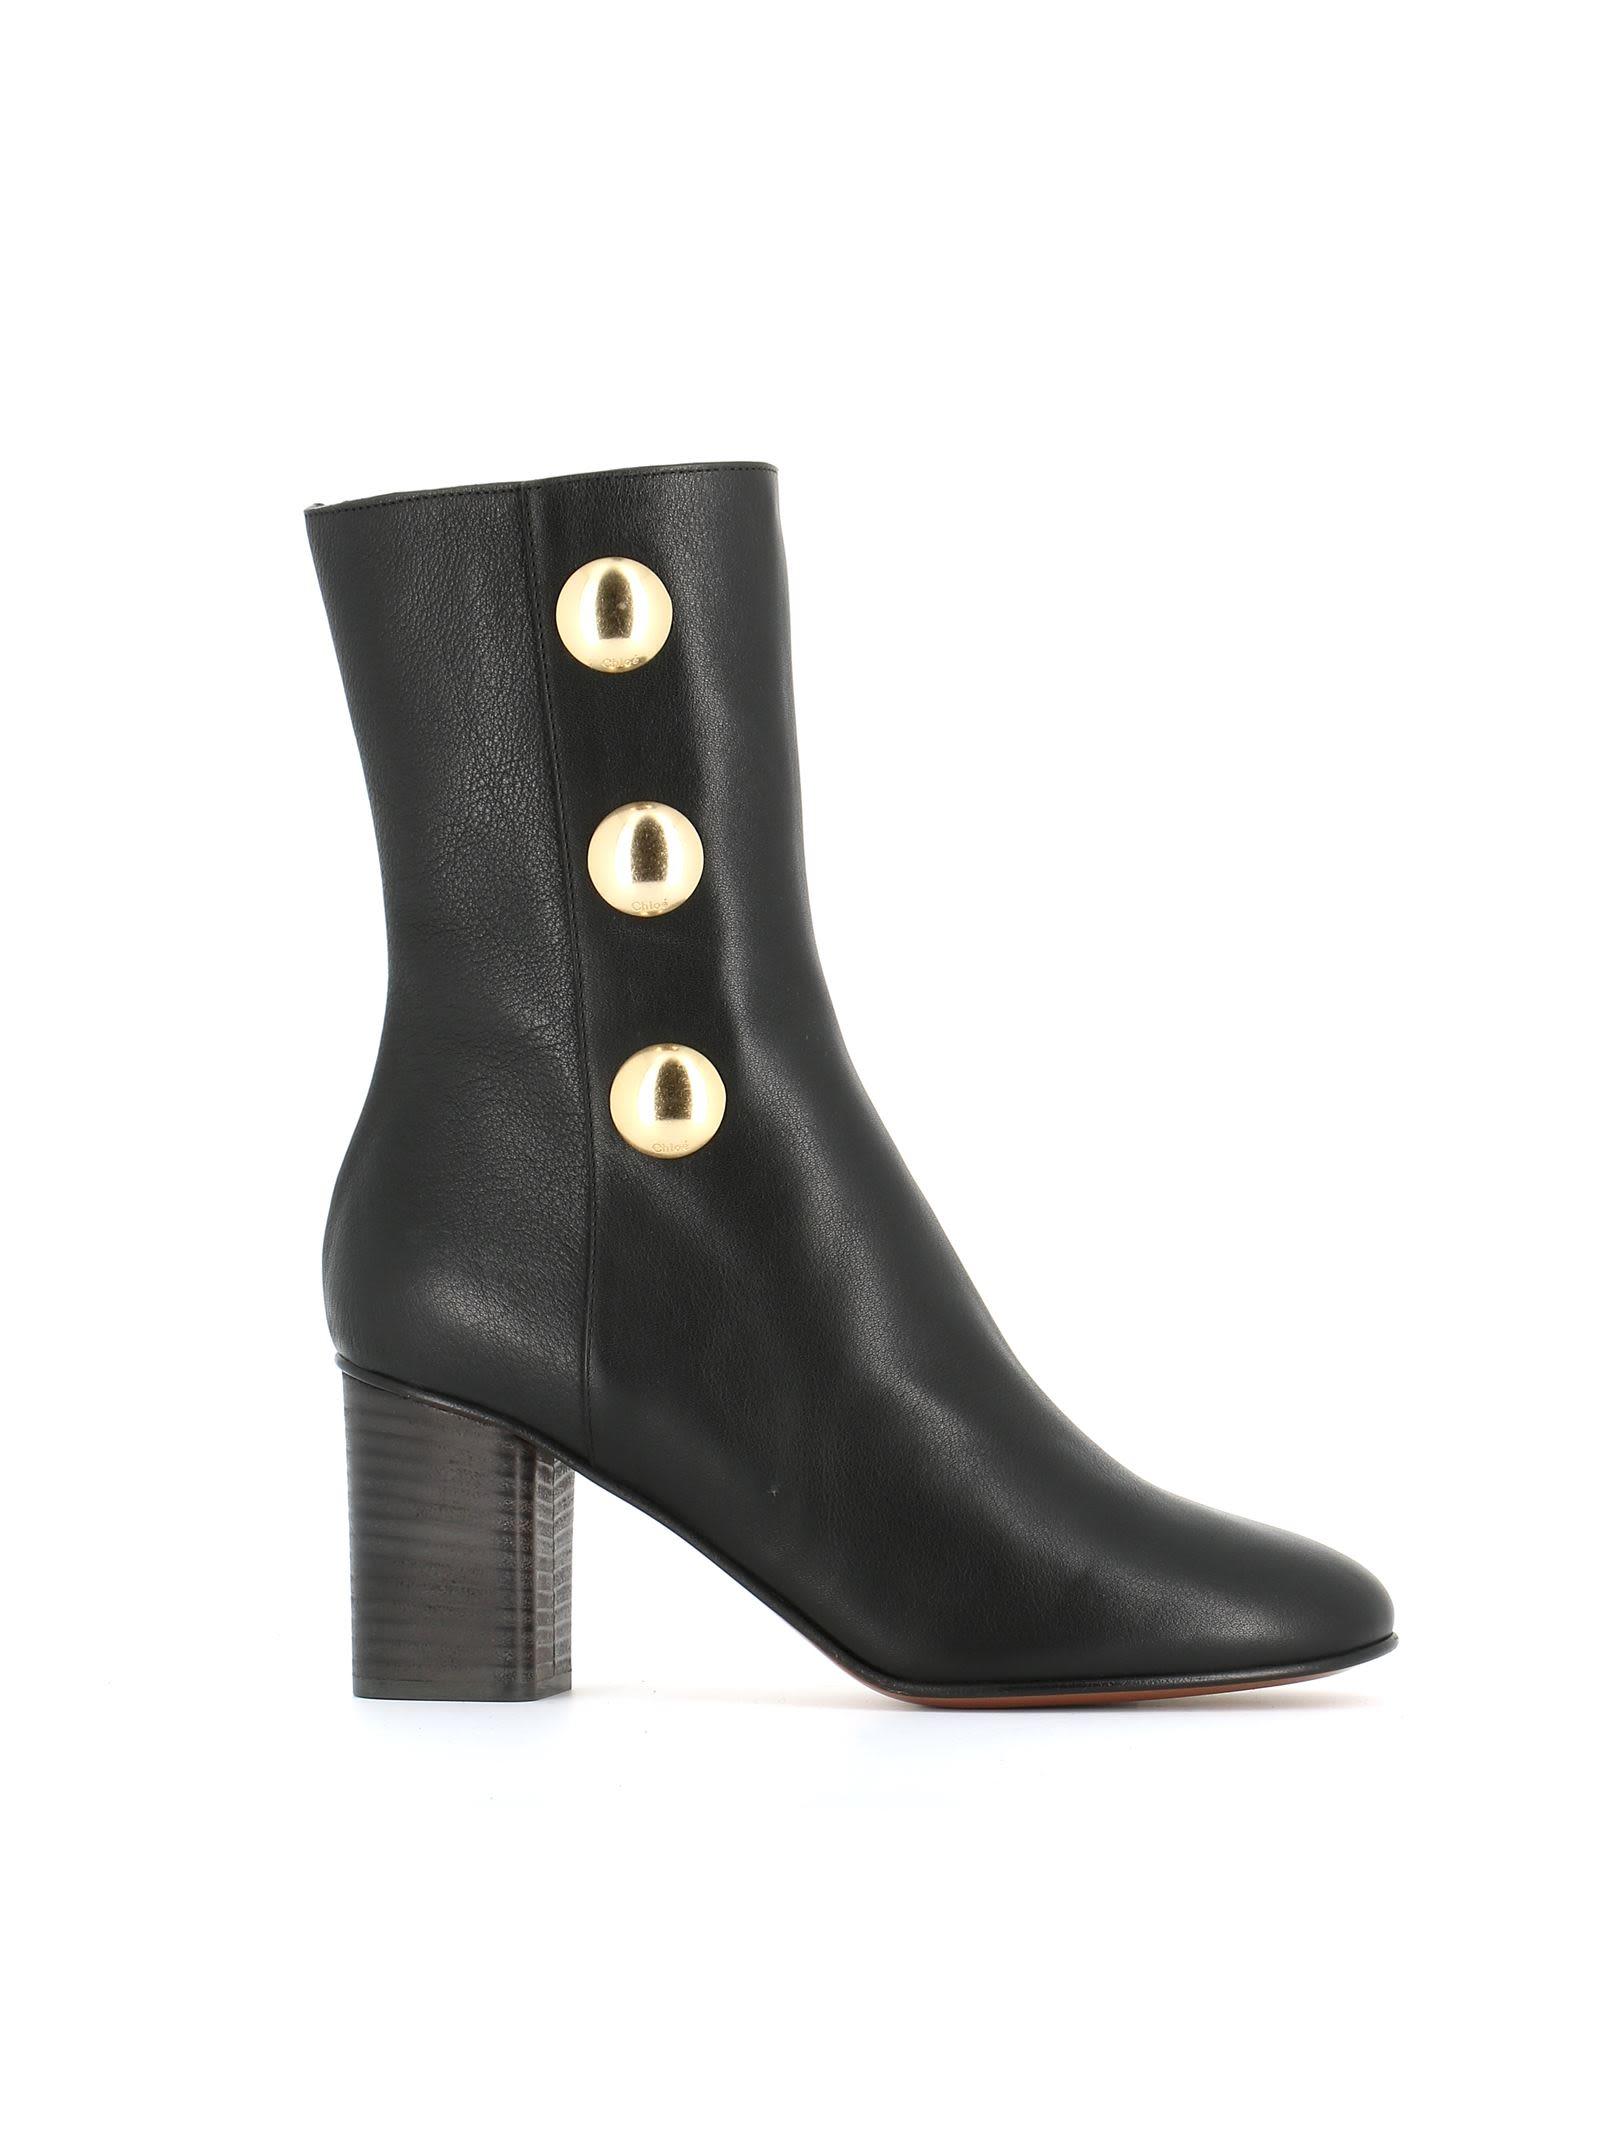 chlo chlo orlando boots black women 39 s boots italist. Black Bedroom Furniture Sets. Home Design Ideas